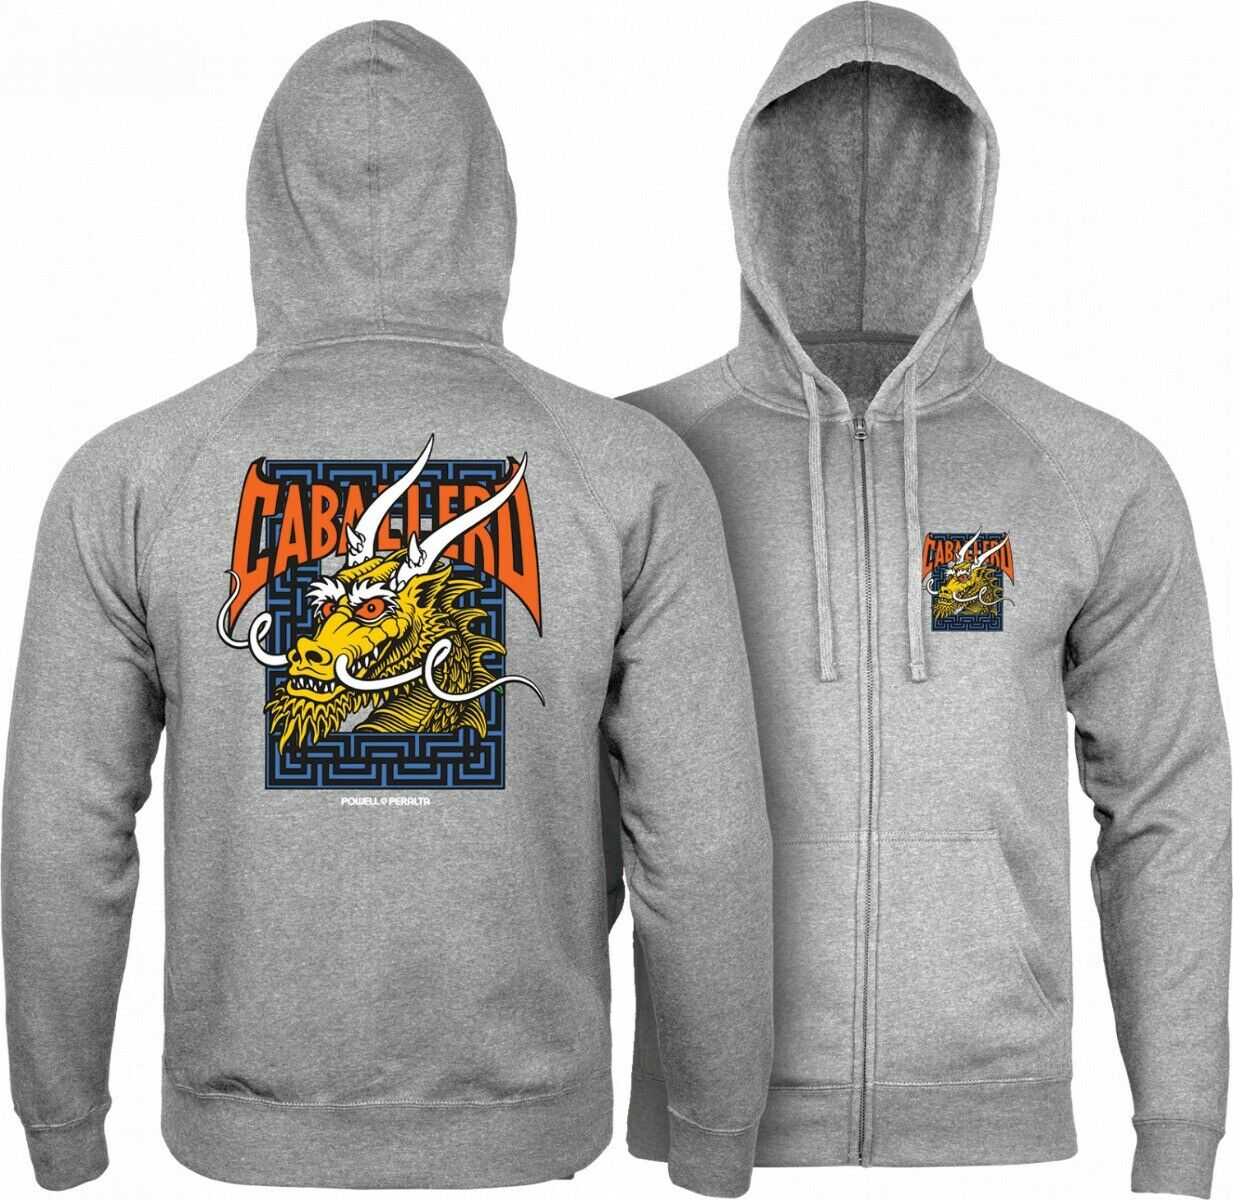 Powell Peralta Steve Caballero DRAGON en BATS ZIP Up Capuchon Guntmetal Groot